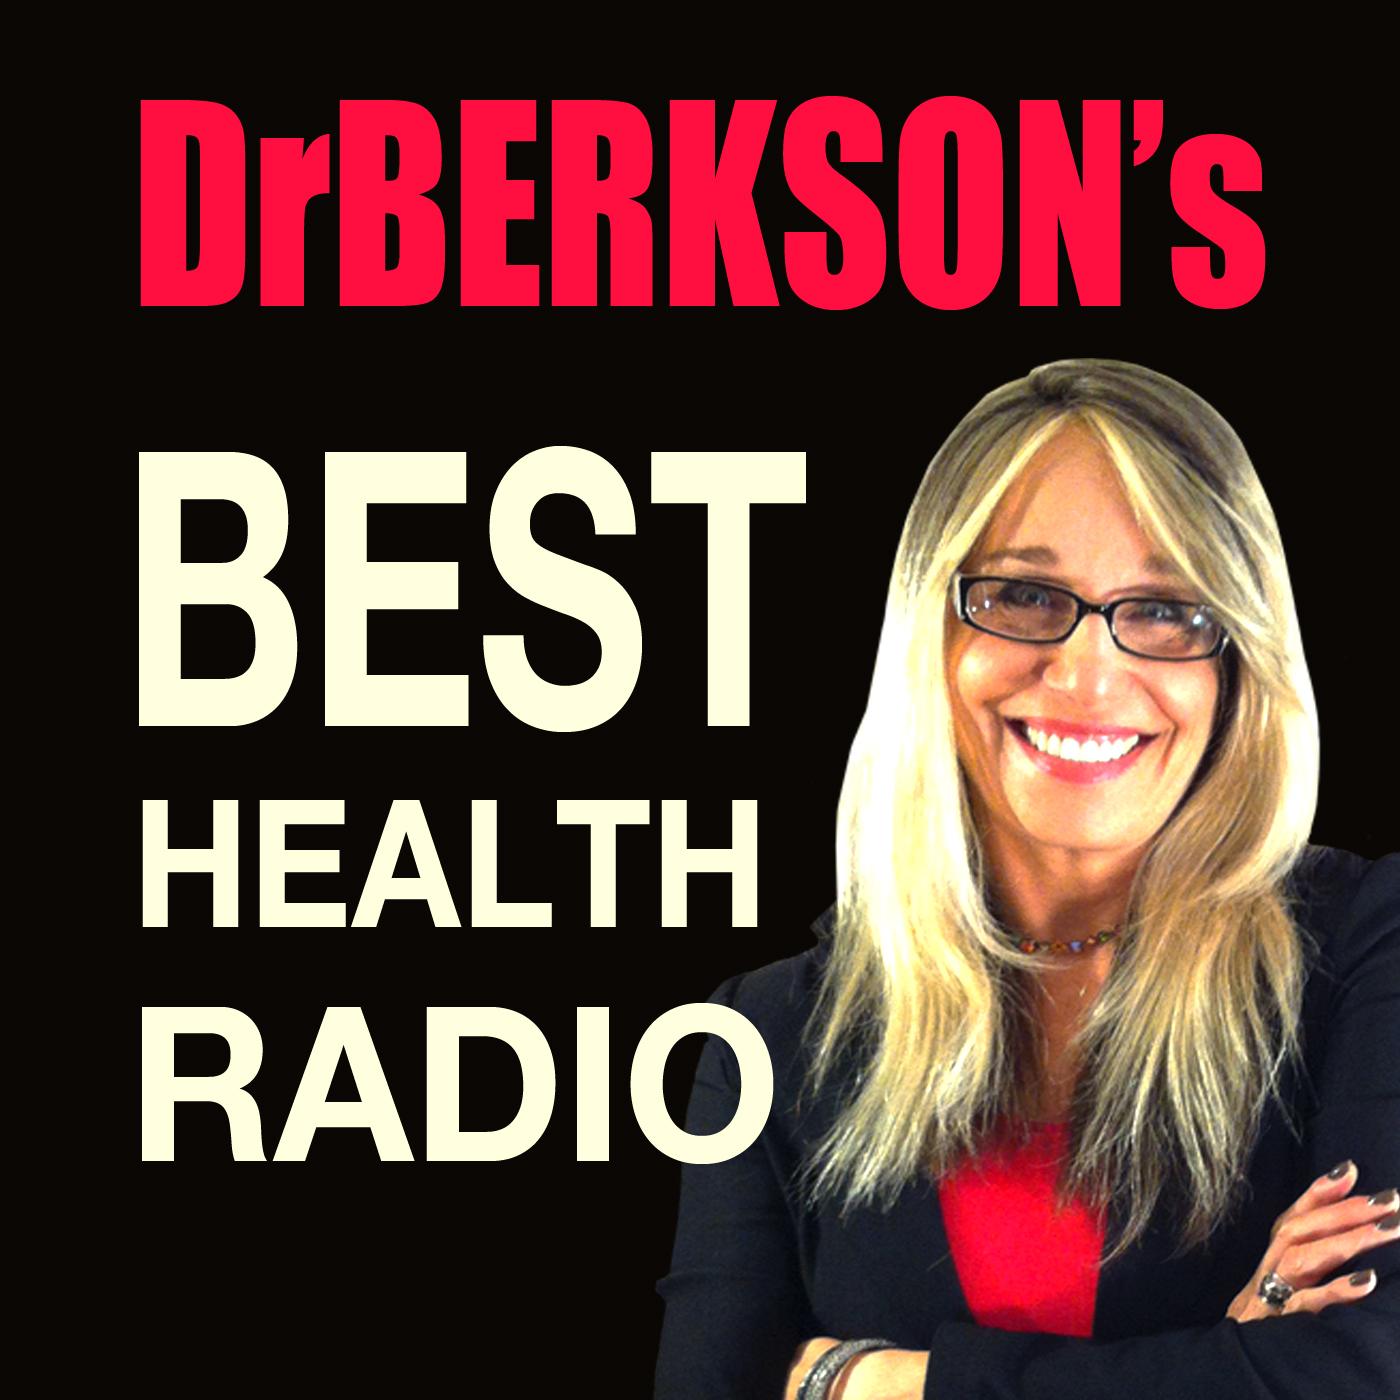 Dr. Berkson's Best Health Radio Podcast show art